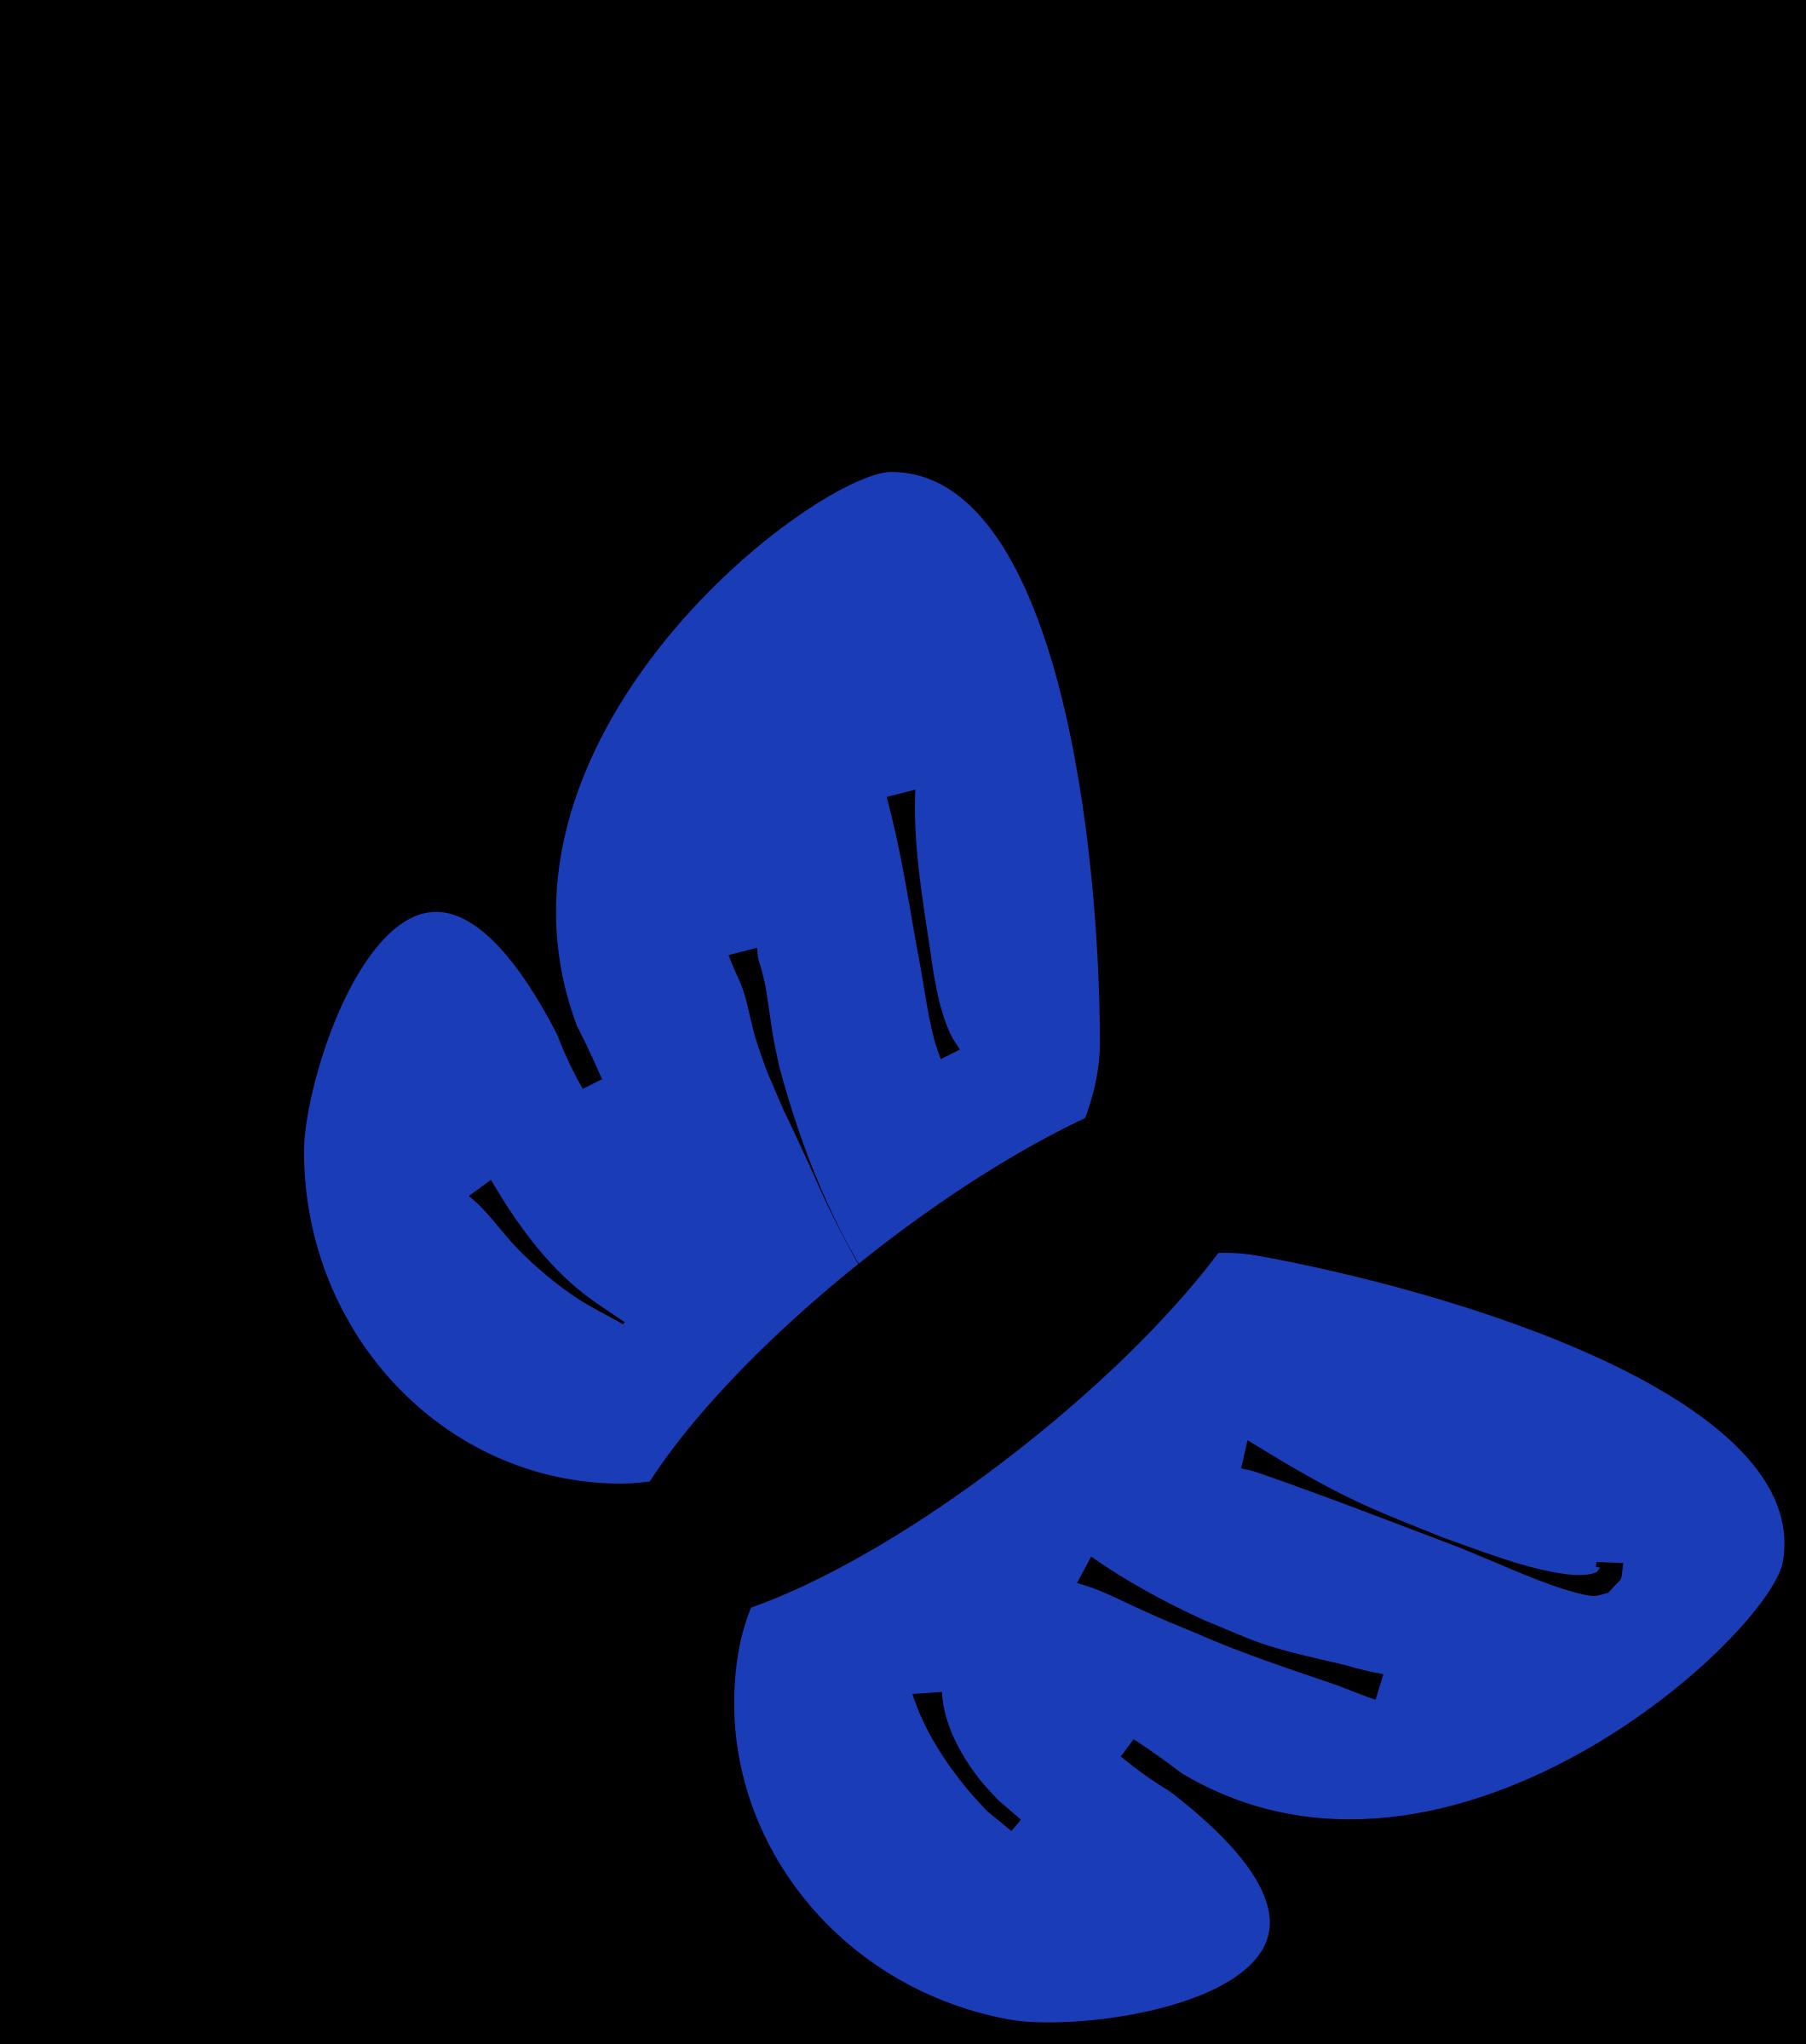 Clipart papillon bleu.